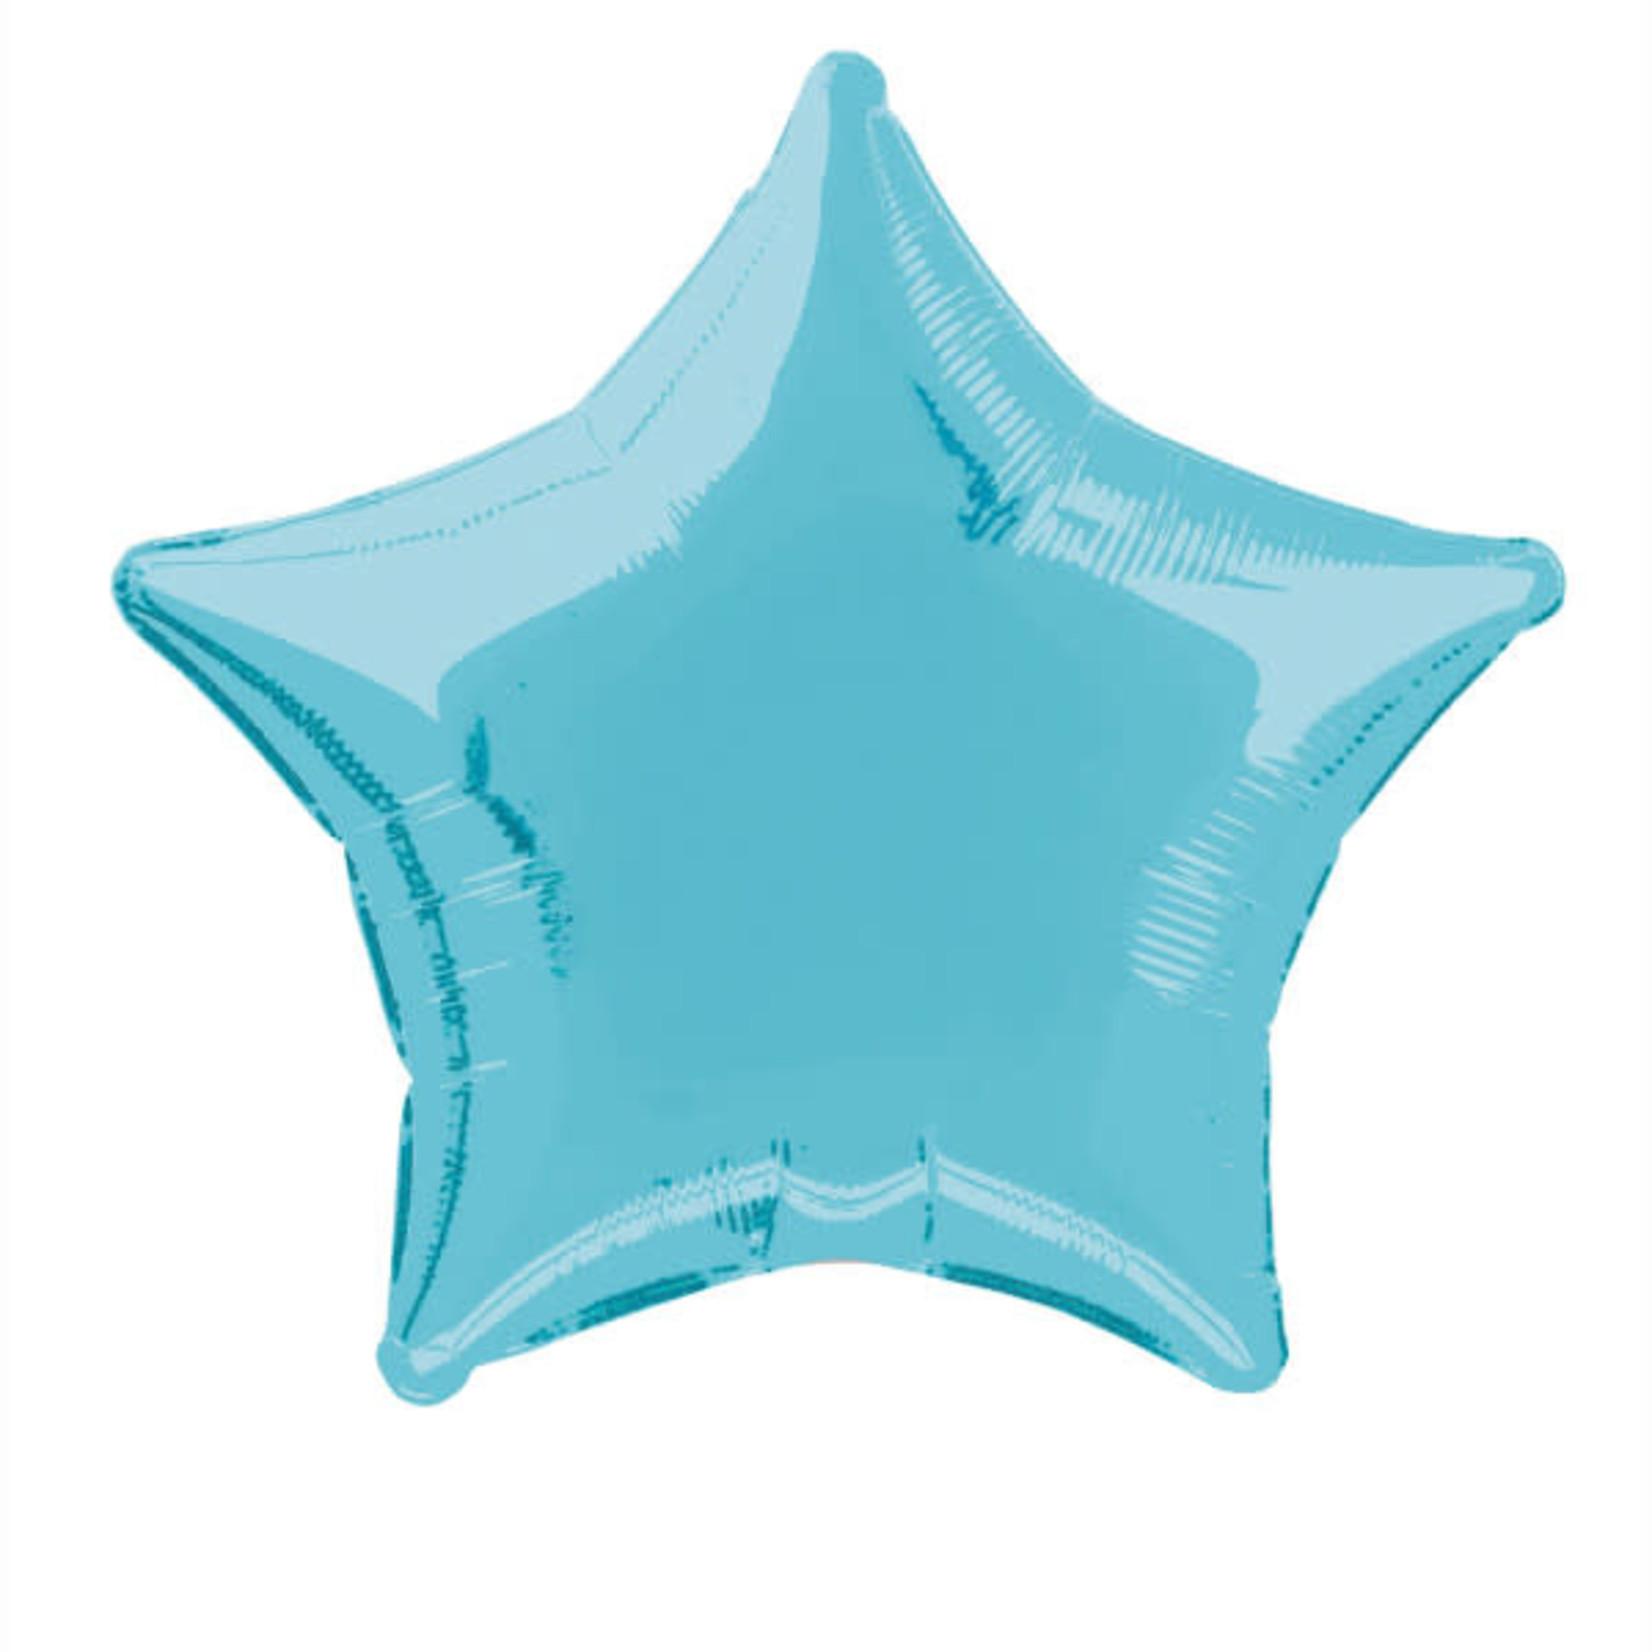 20'' BABY BLUE STAR SHAPED BALLOON